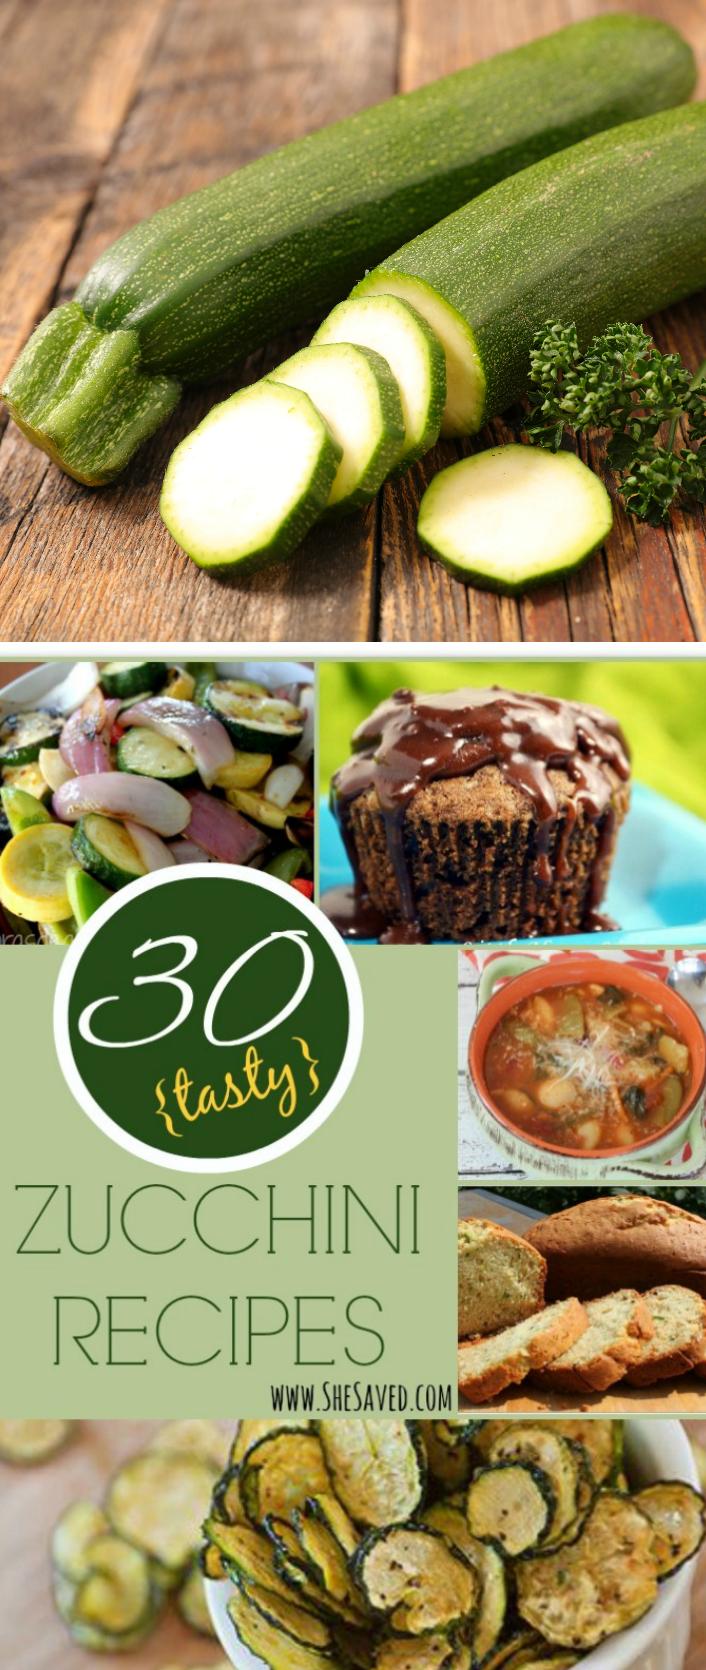 30 Zucchini Recipes that you will love